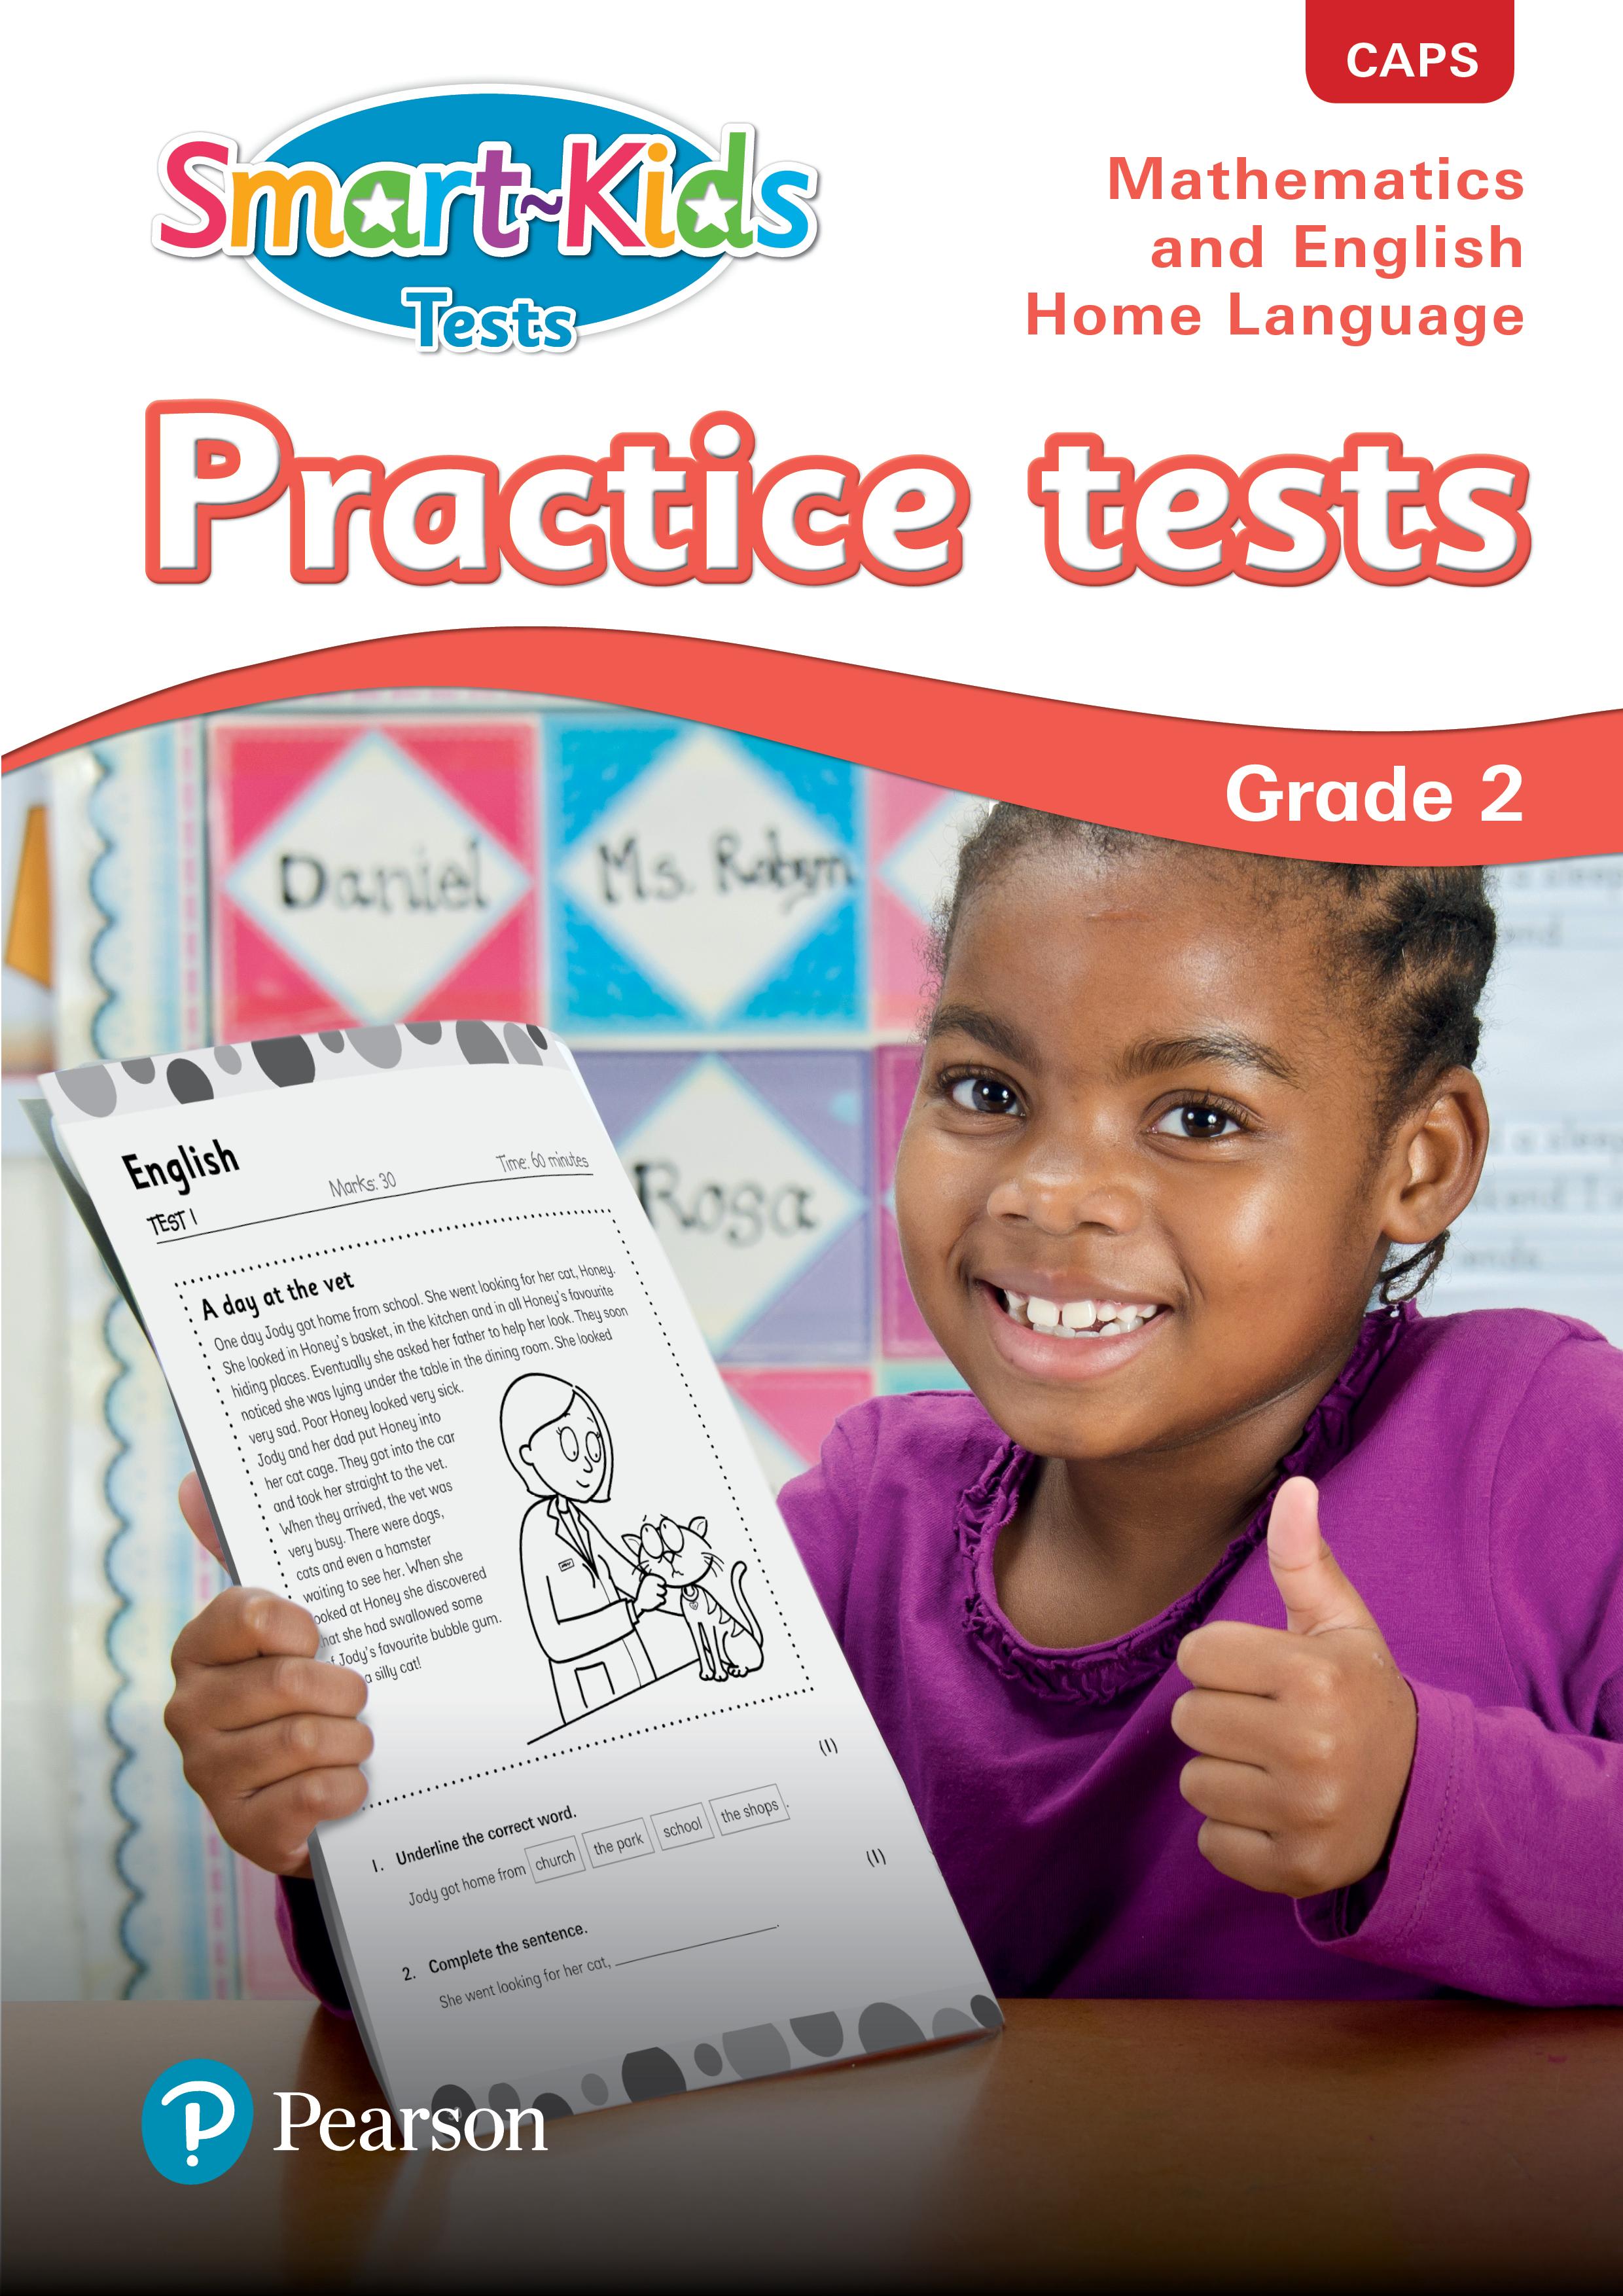 Smart-Kids Practice Tests Mathematics and English Home Language: Grade 2